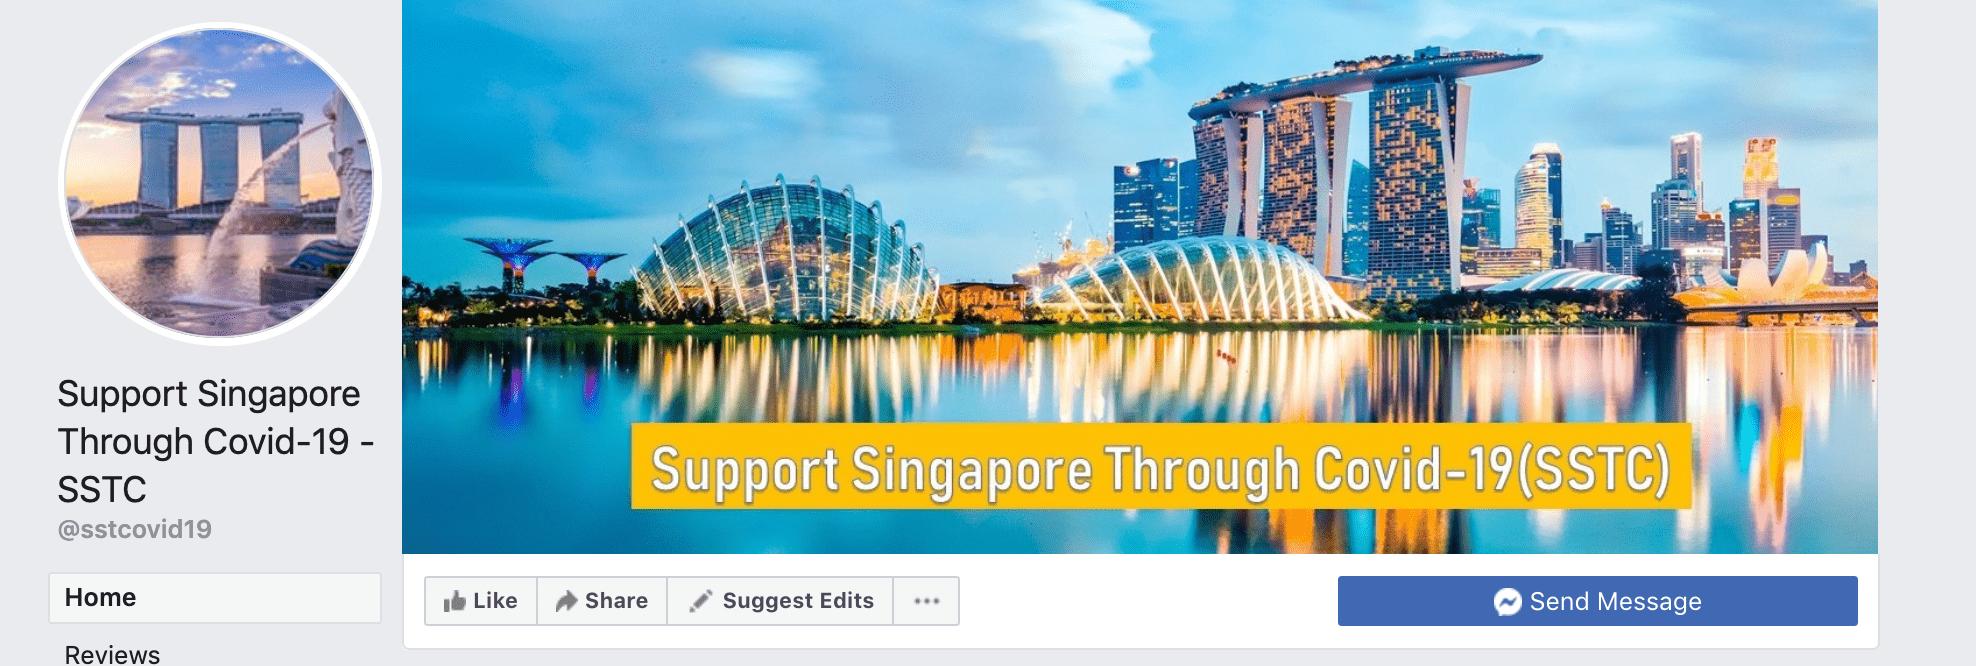 SSTC FB Page